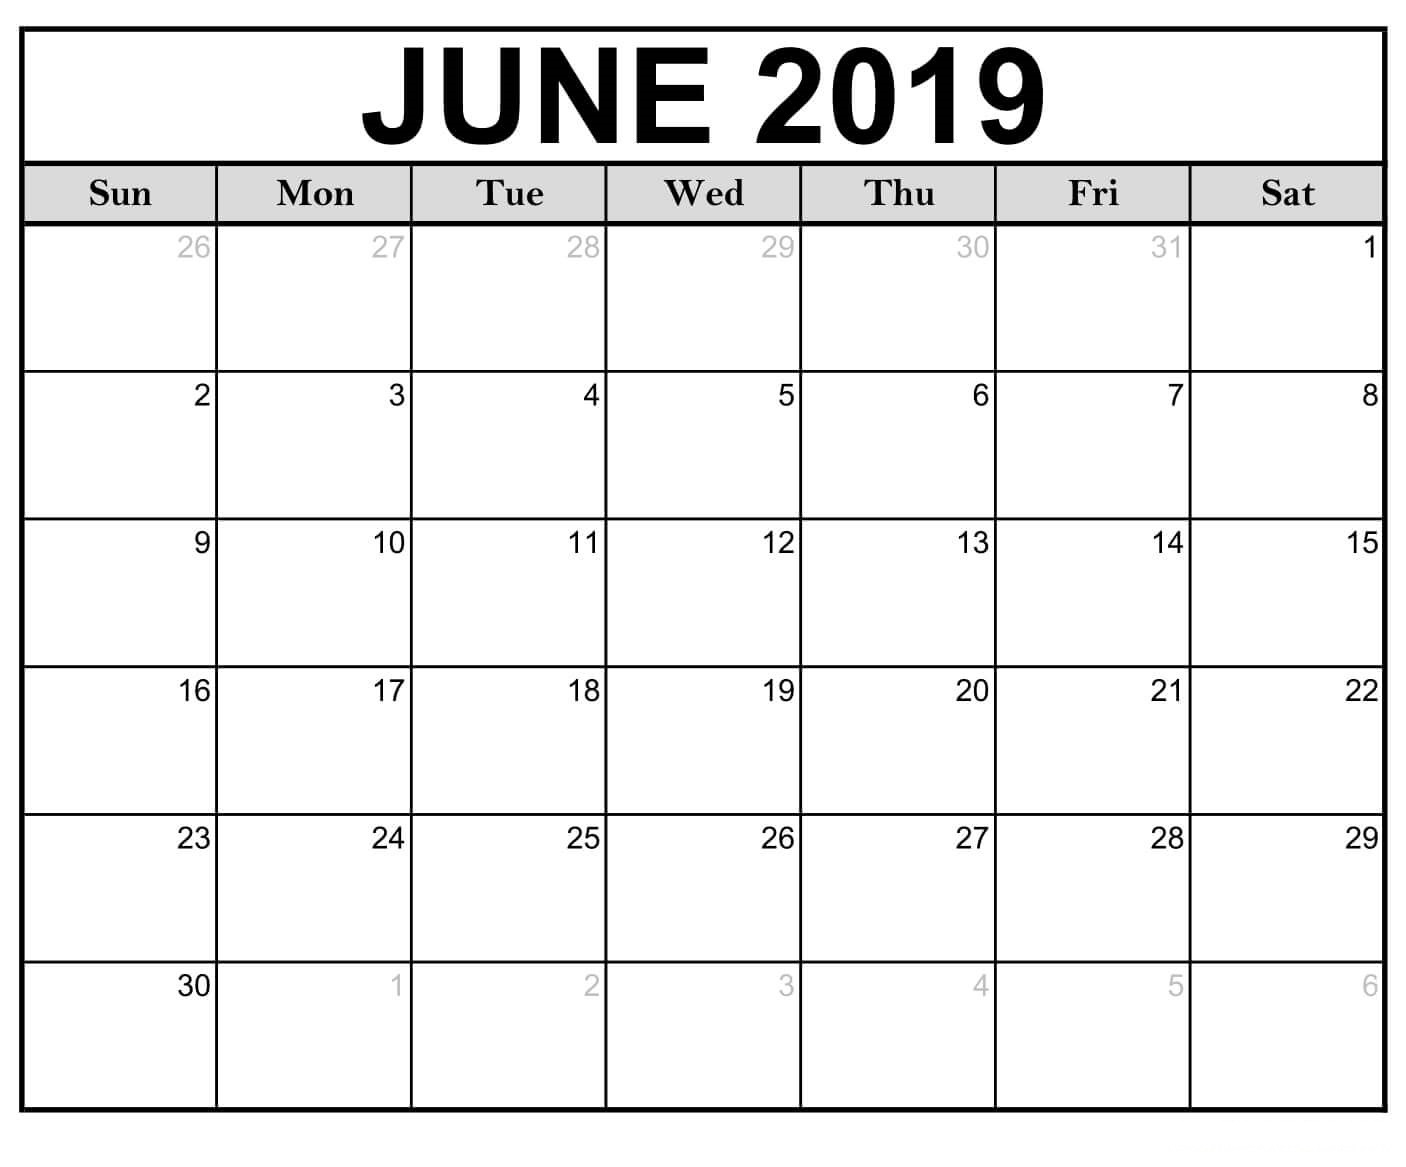 June 2019 Calendar Printable Blank Templates - Calendar-Kart